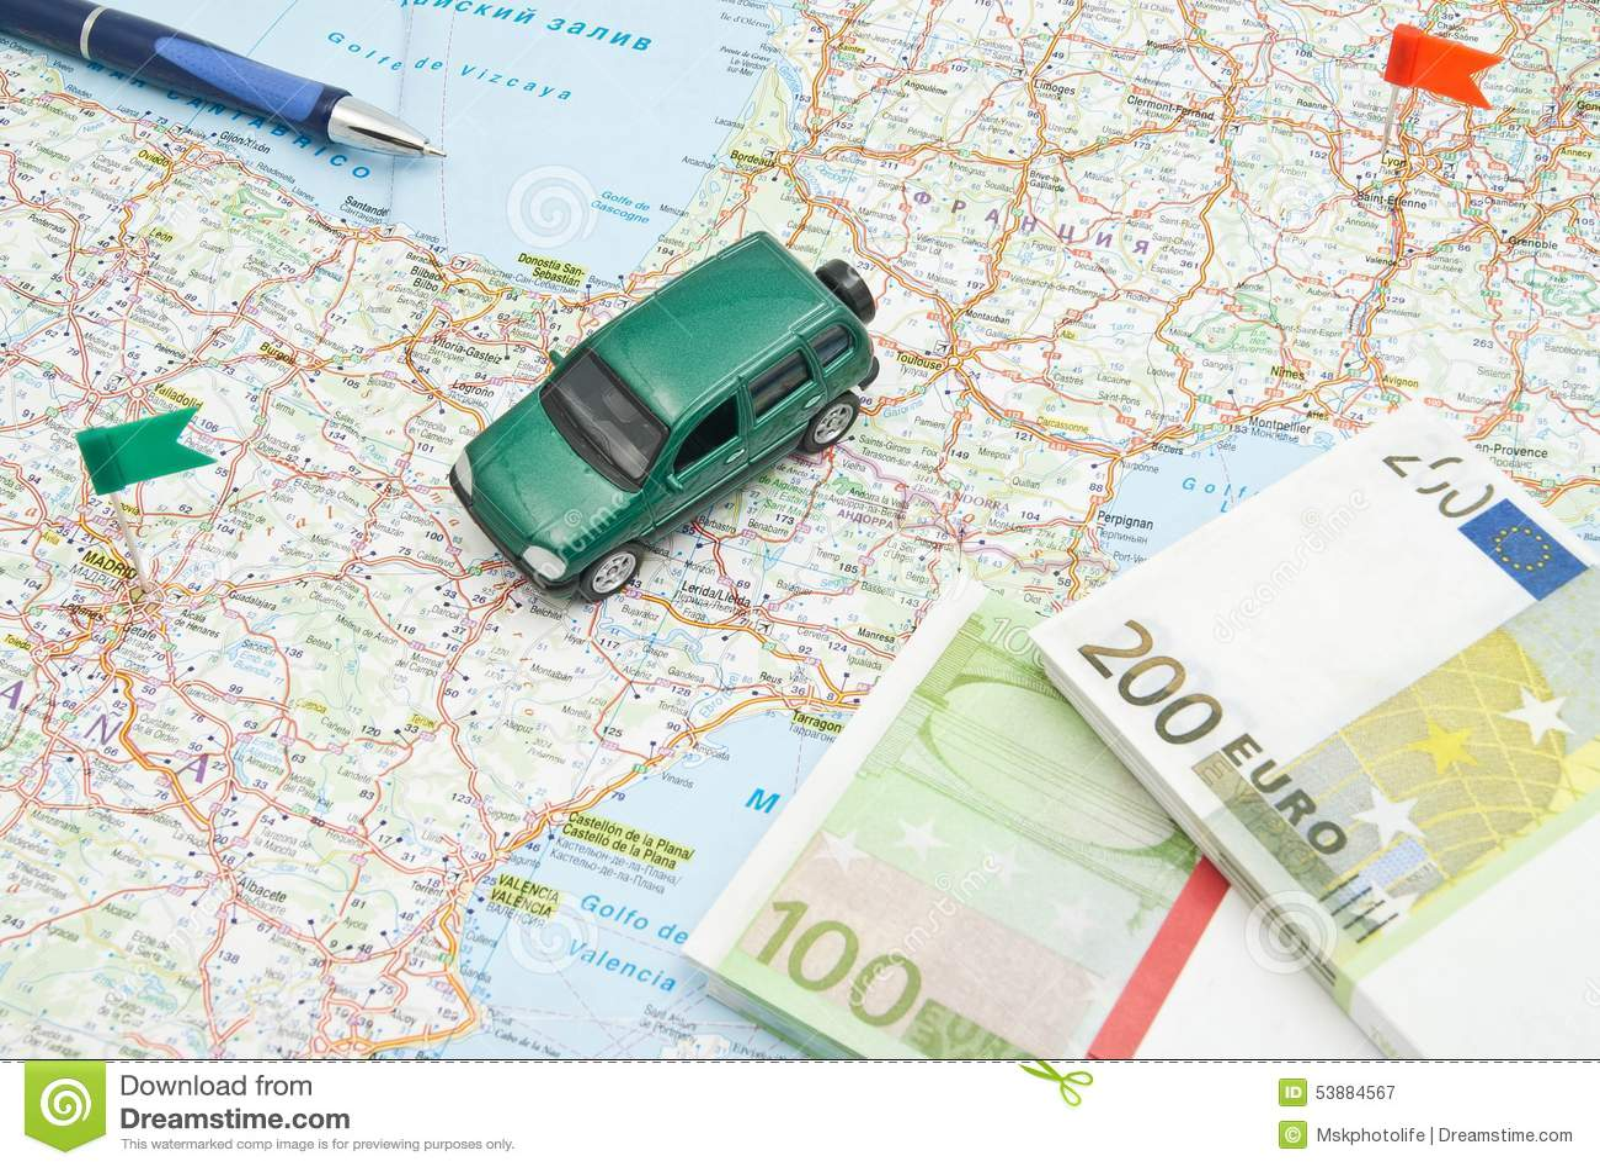 stylo notes et voiture verte sur la carte image stock image du europ en sens 53884567. Black Bedroom Furniture Sets. Home Design Ideas